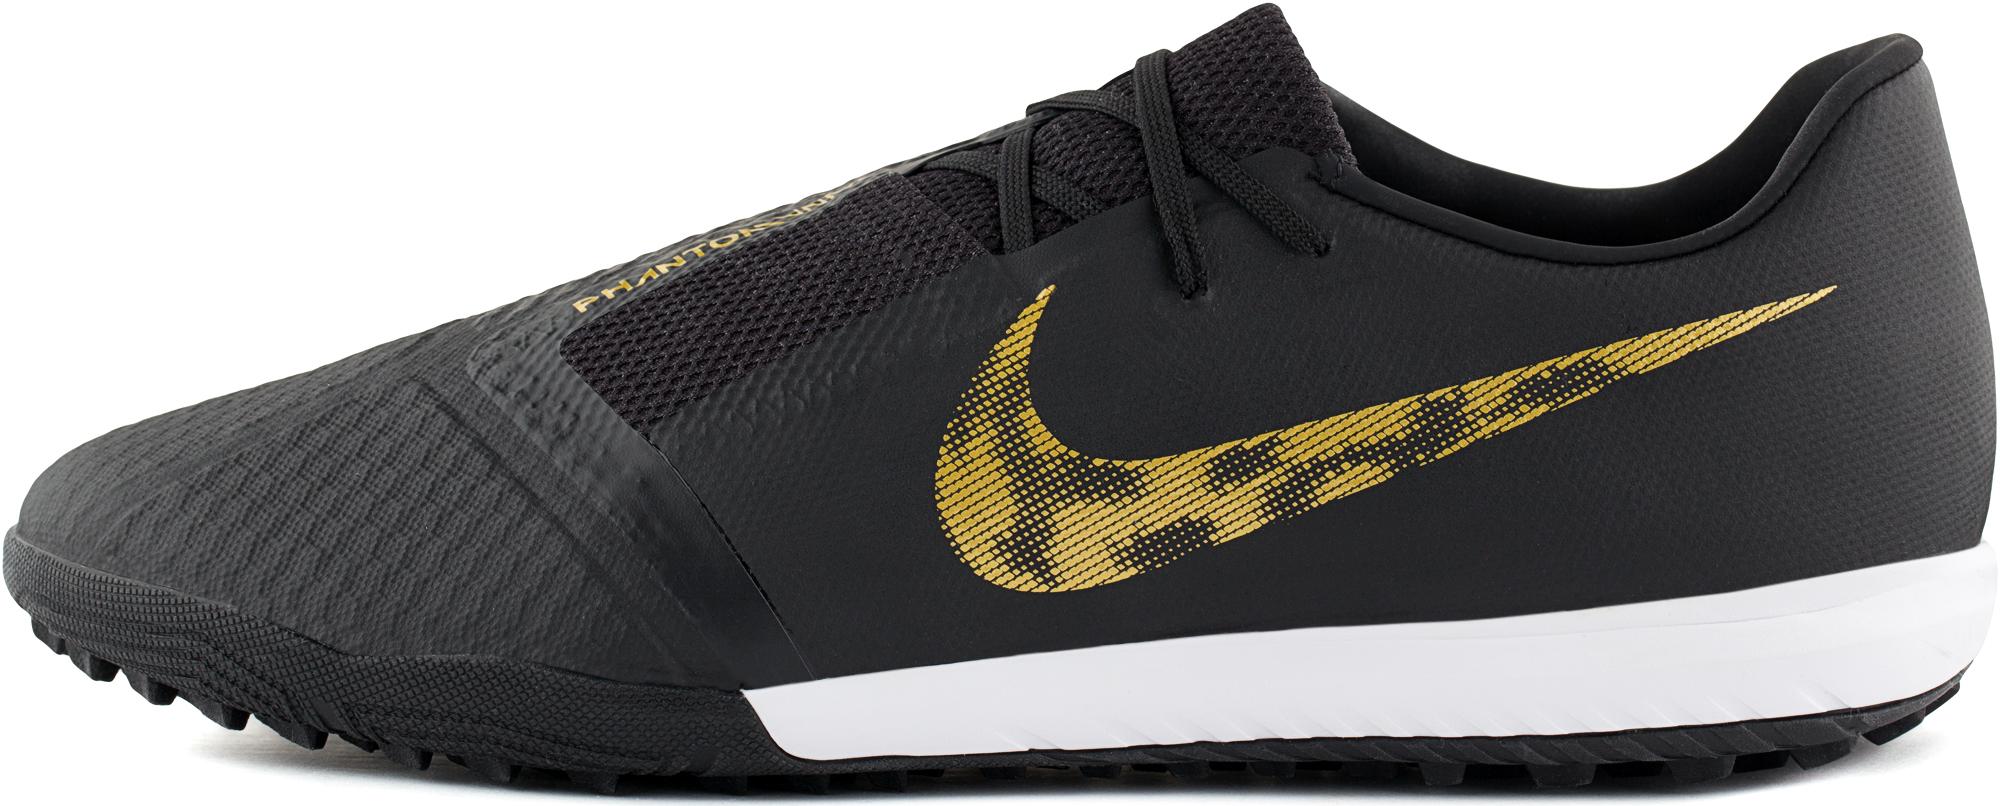 Nike Бутсы мужские Phantom Venom, размер 45